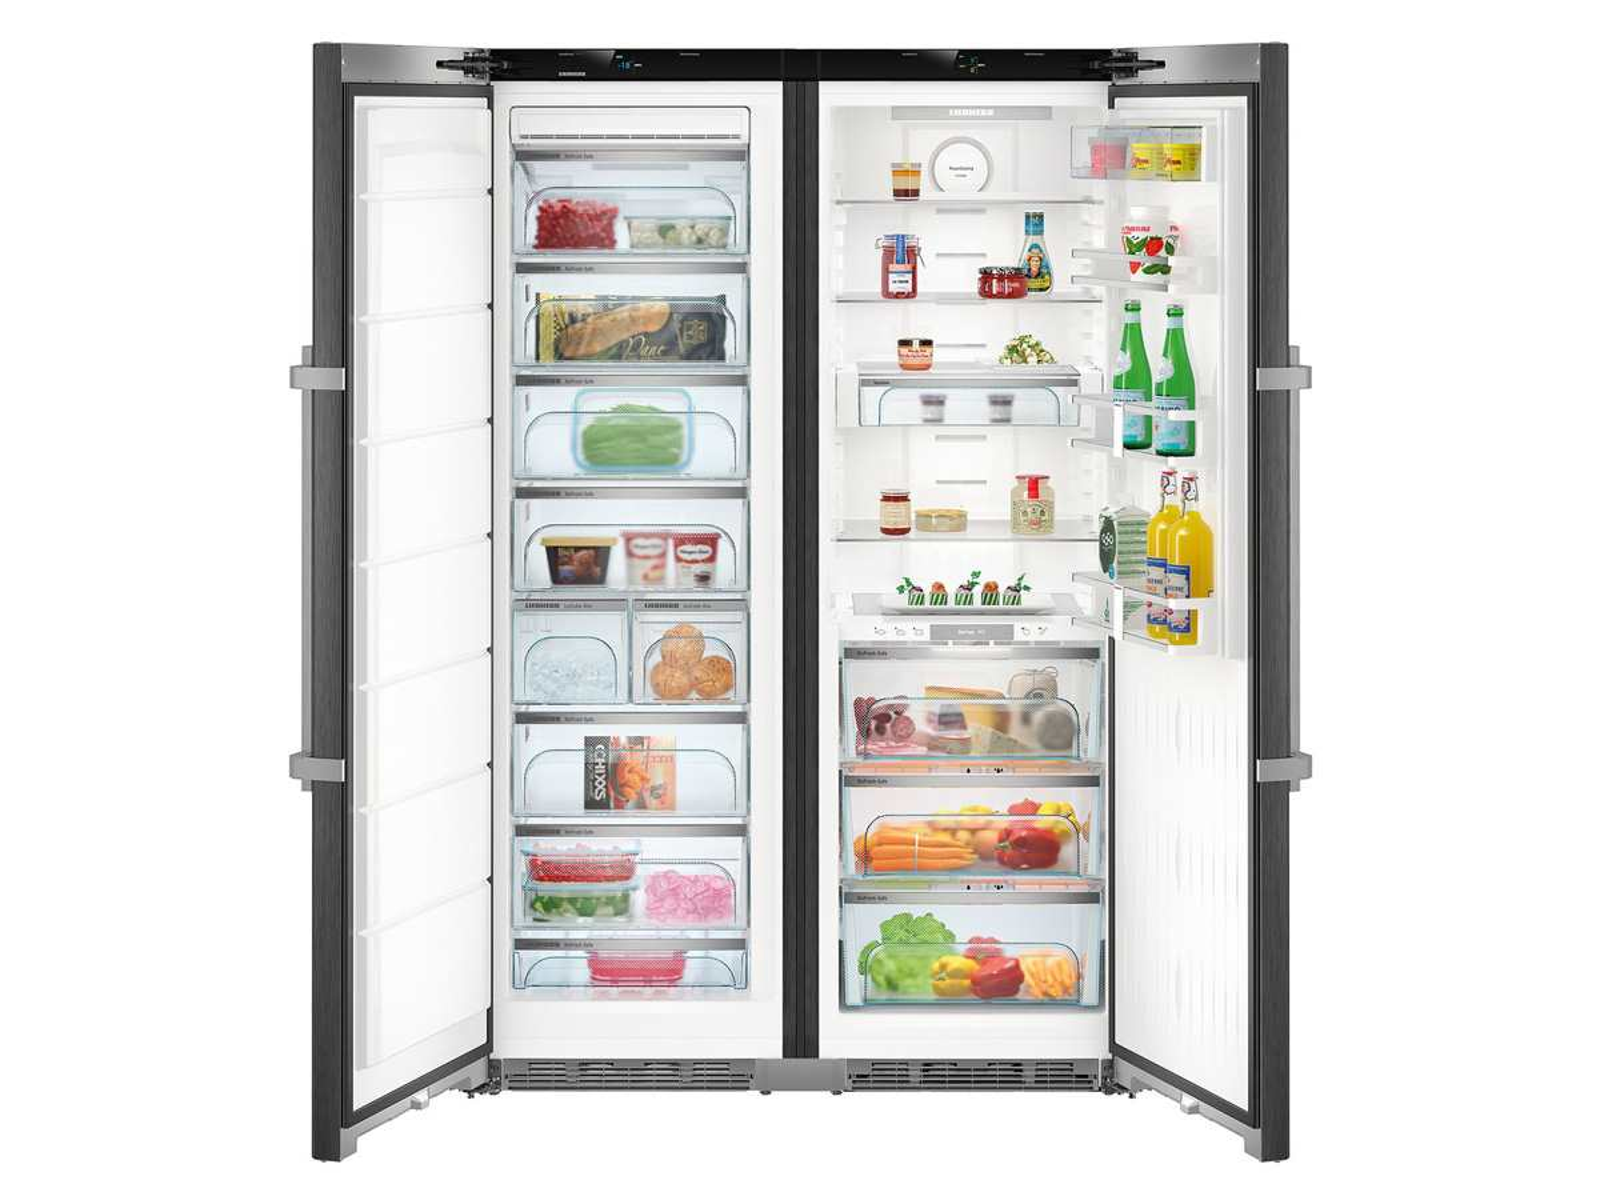 Side By Side Kühlschrank Wasseranschluss Verlängern : Liebherr sbsef comfort side by side kühl gefrier kombination